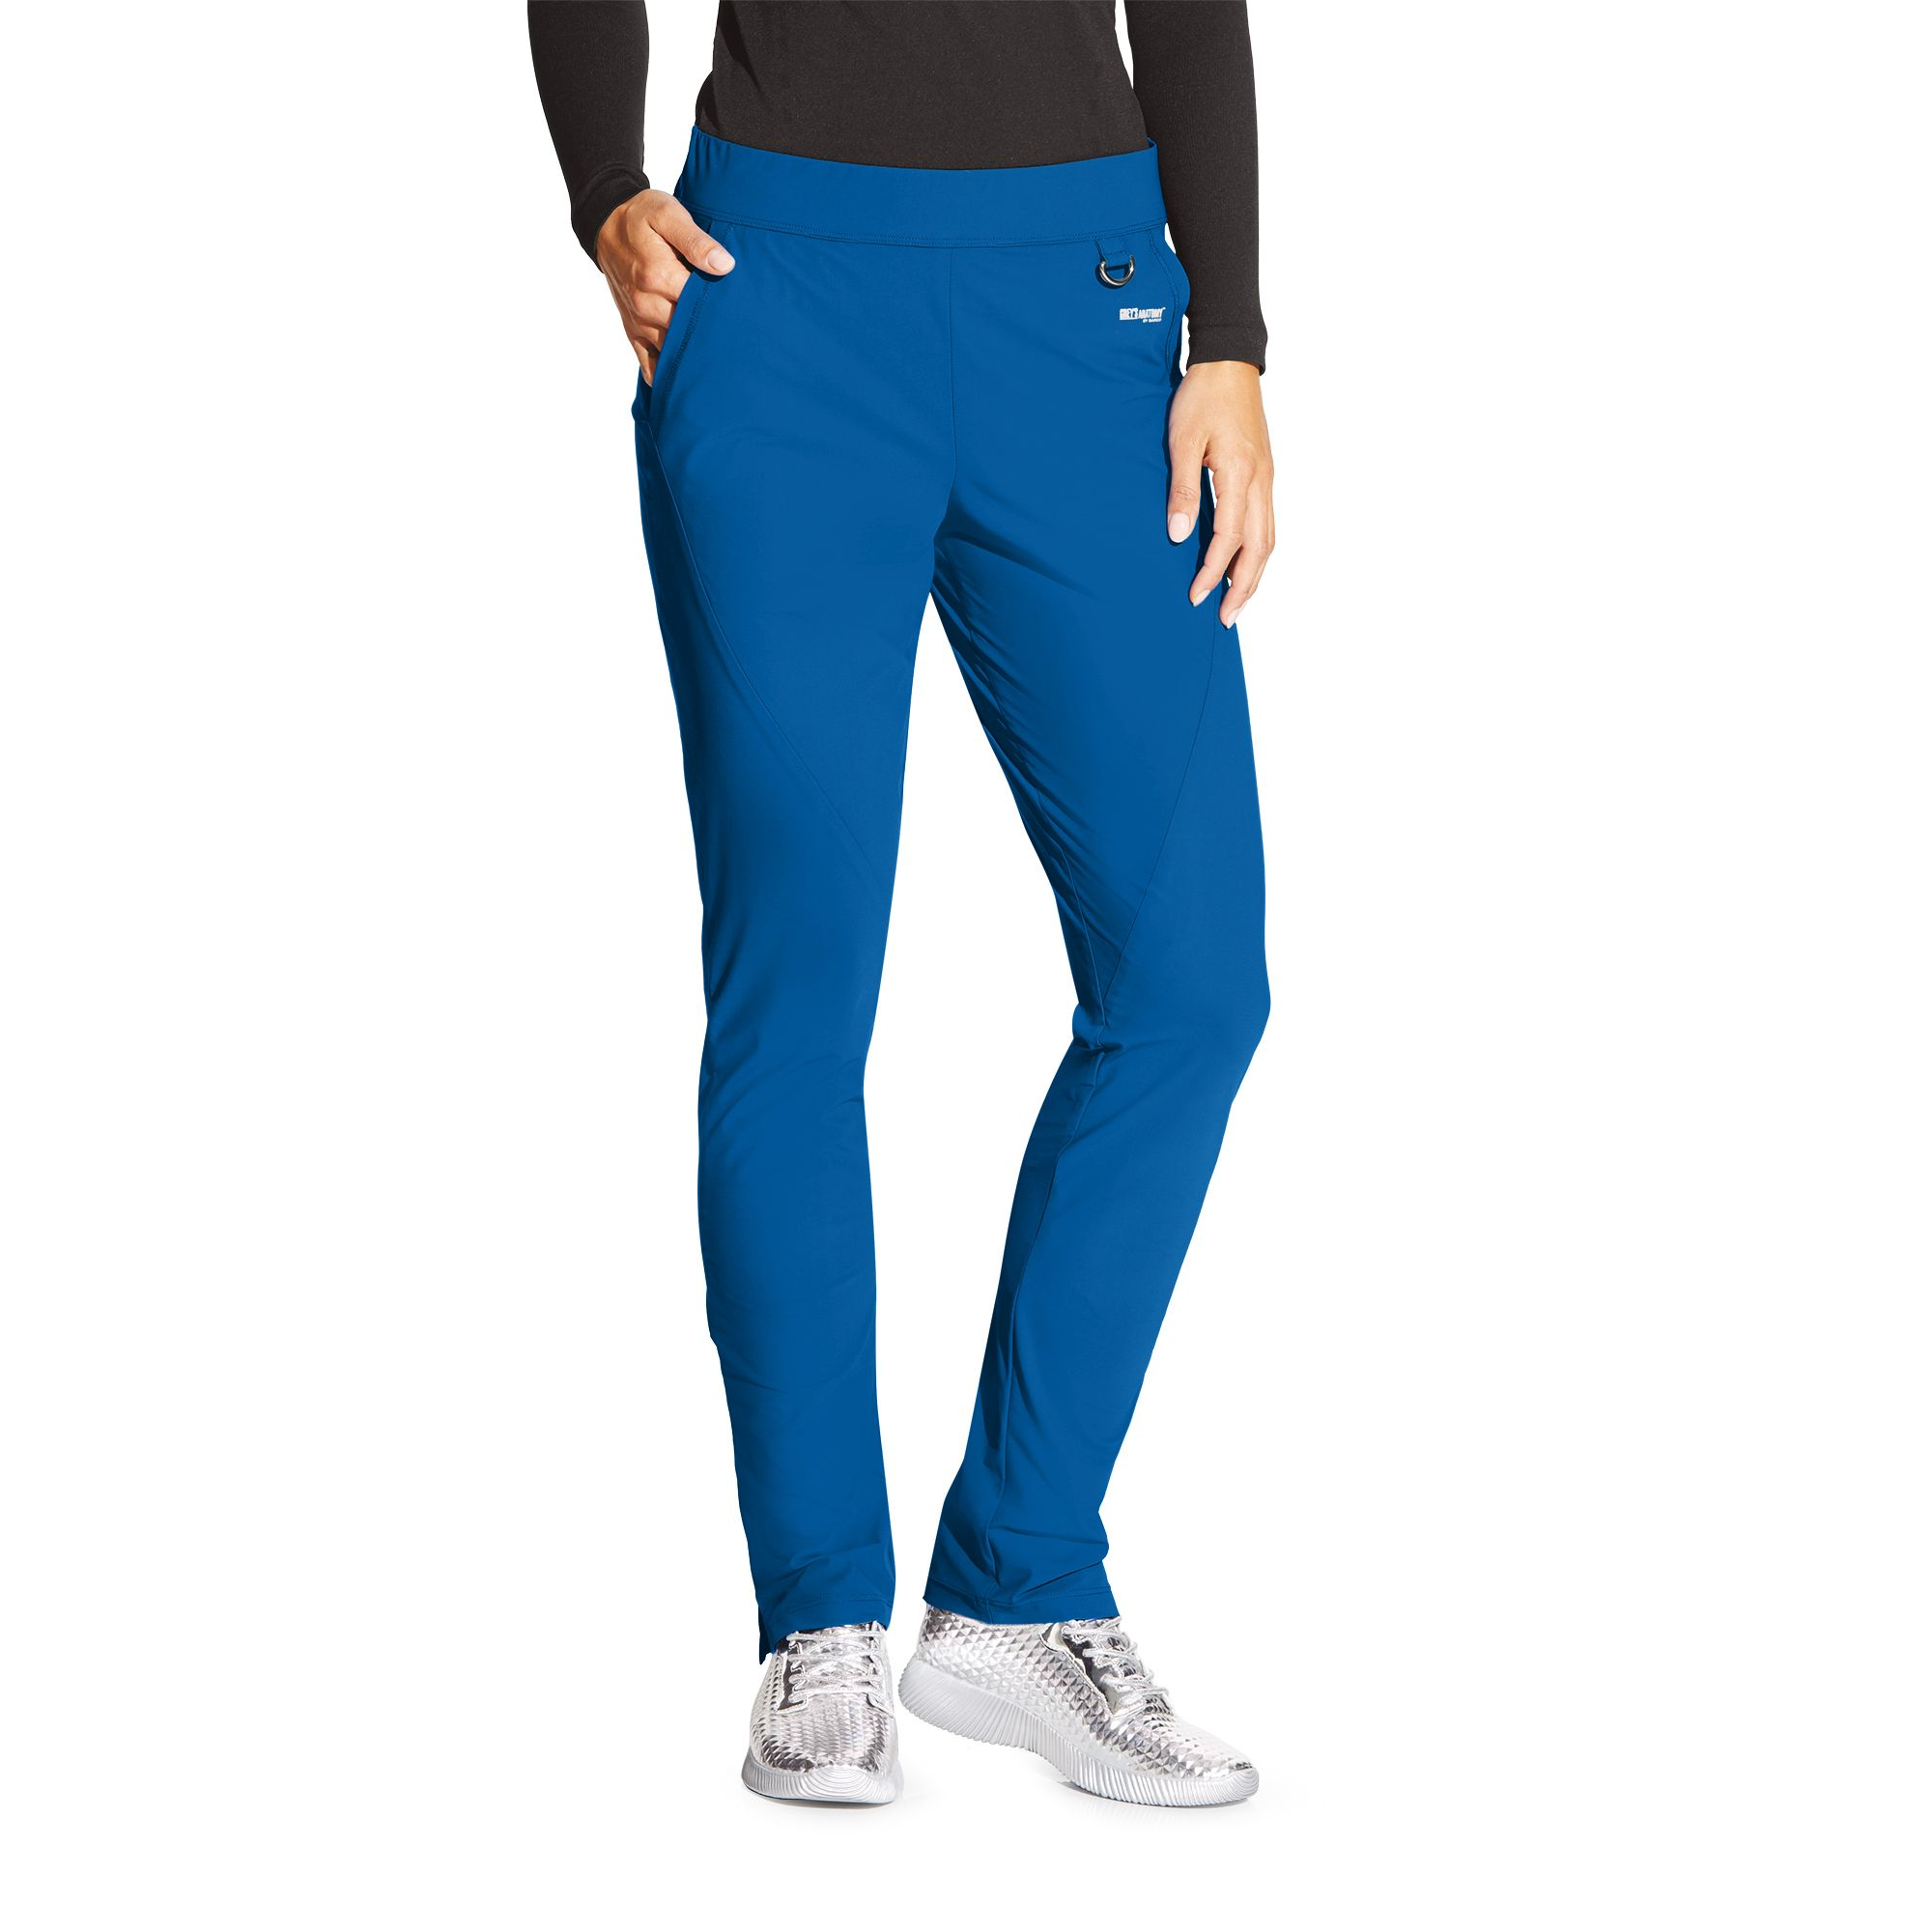 EDGE - NEW Stretch 3 Pocket Pant-